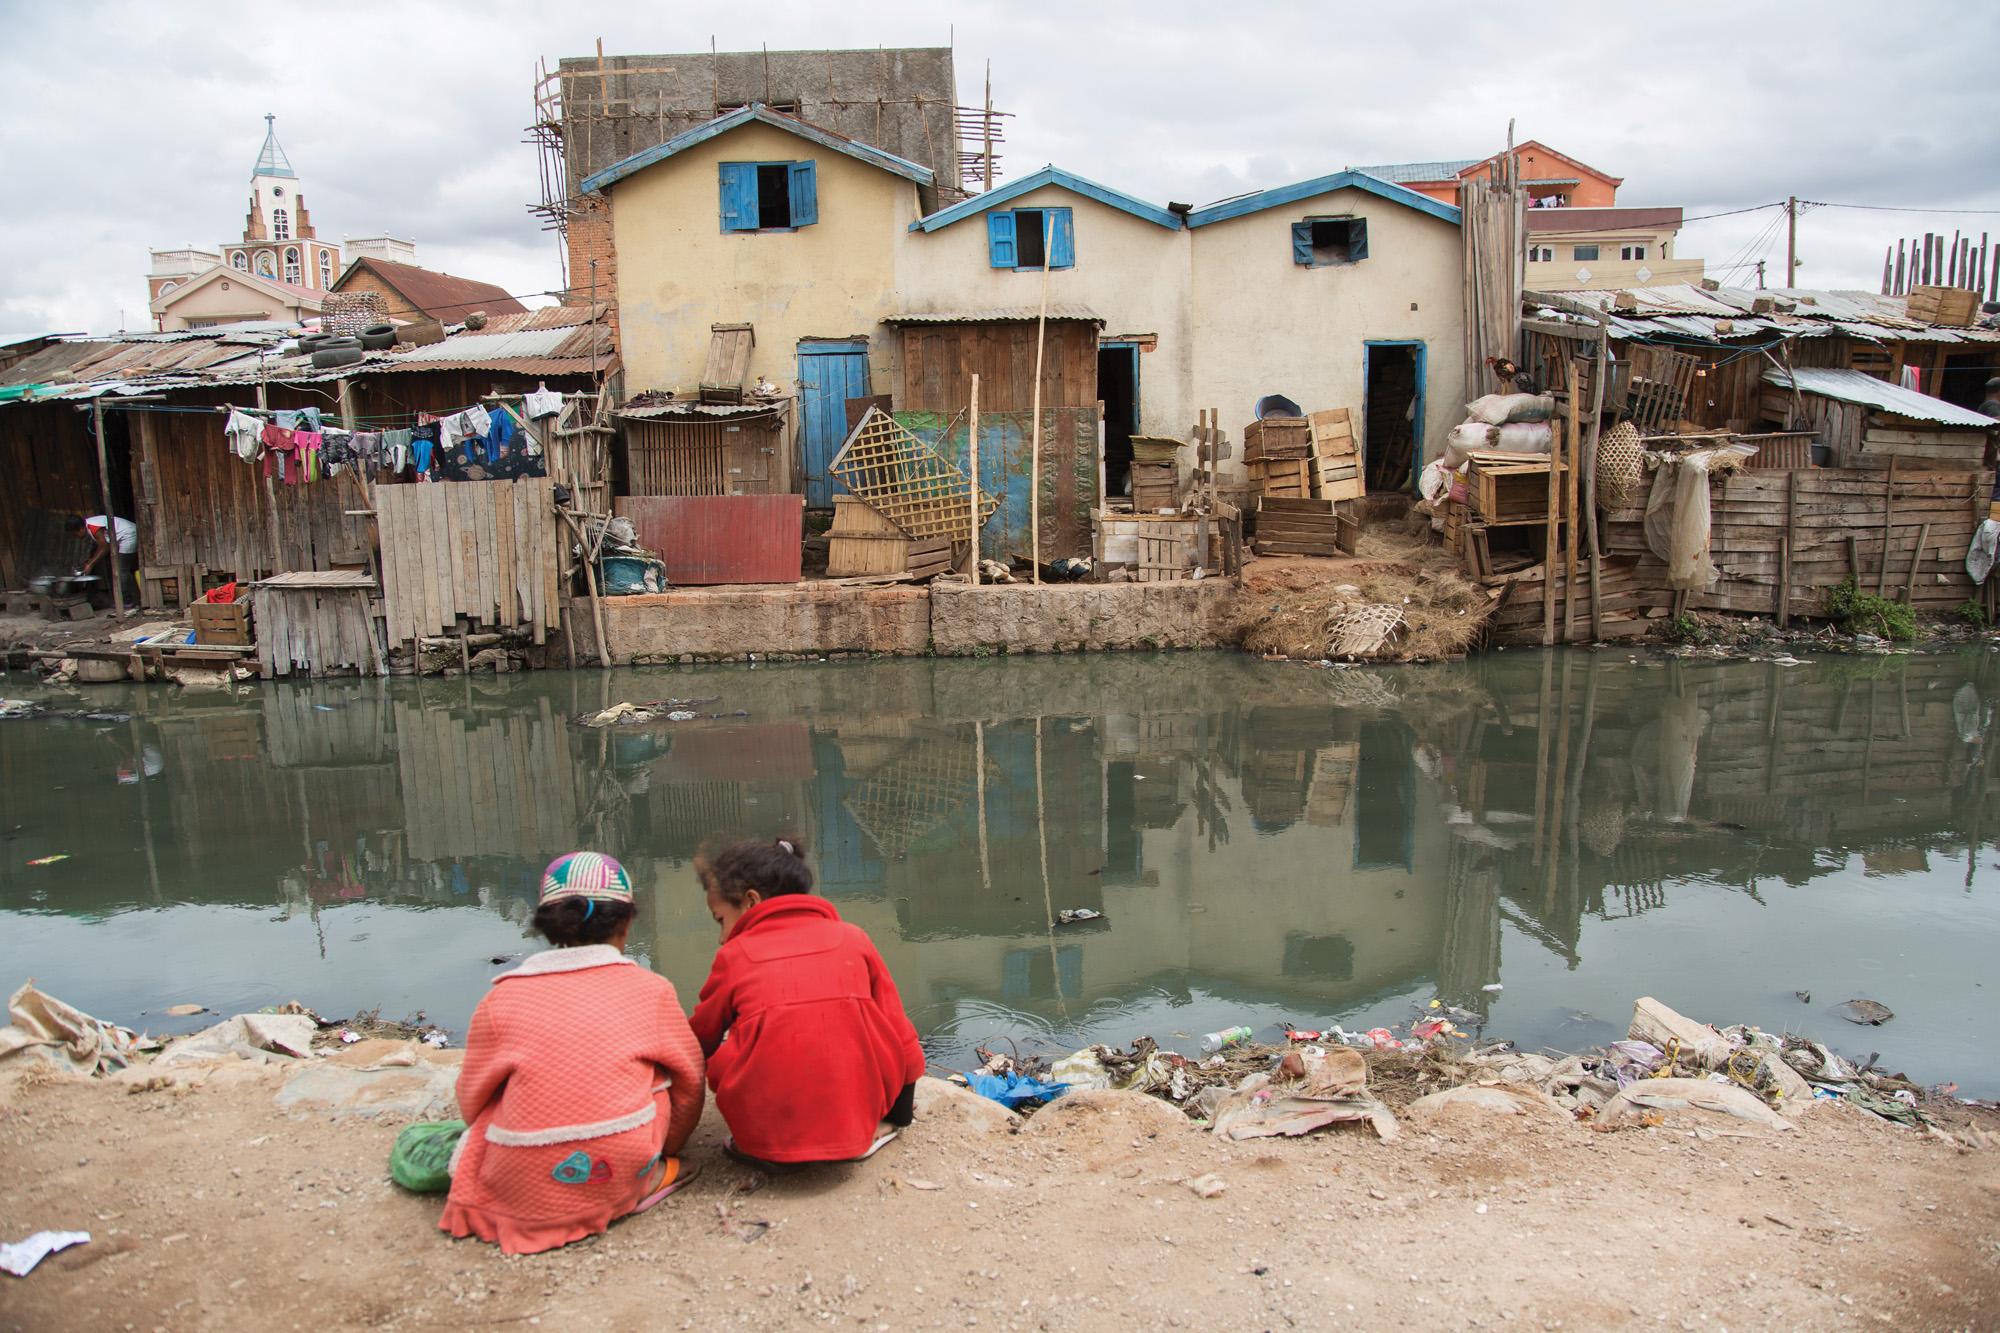 https://s12982.pcdn.co/wp-content/uploads/2015/01/Pollution-in-Antananarivo.jpg